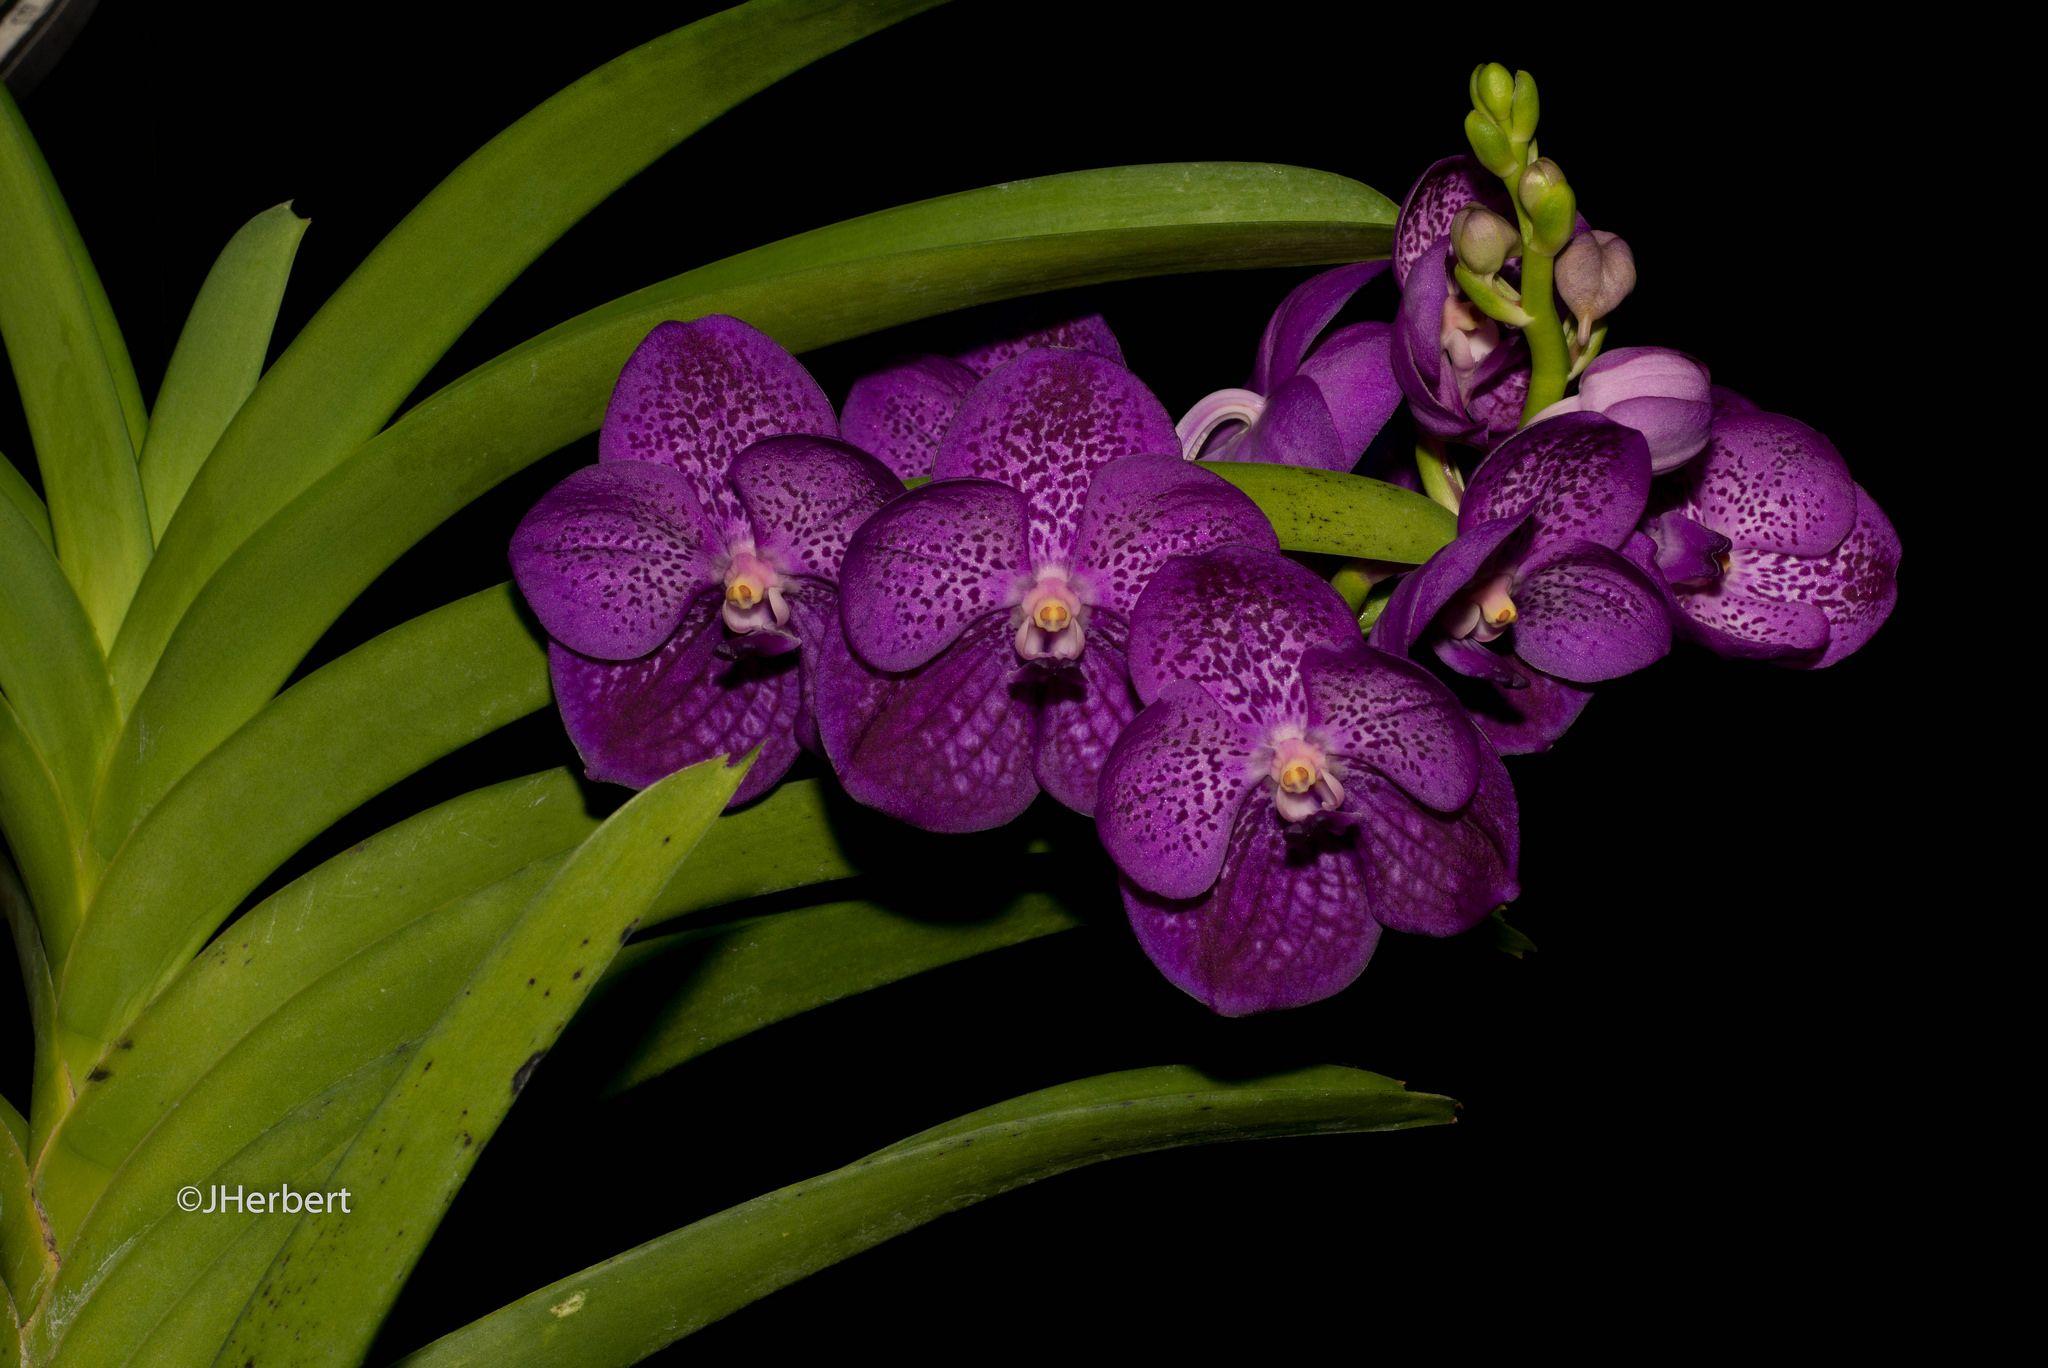 Vanda John De Biase 'Fuchs Indigo' | by orchid dude